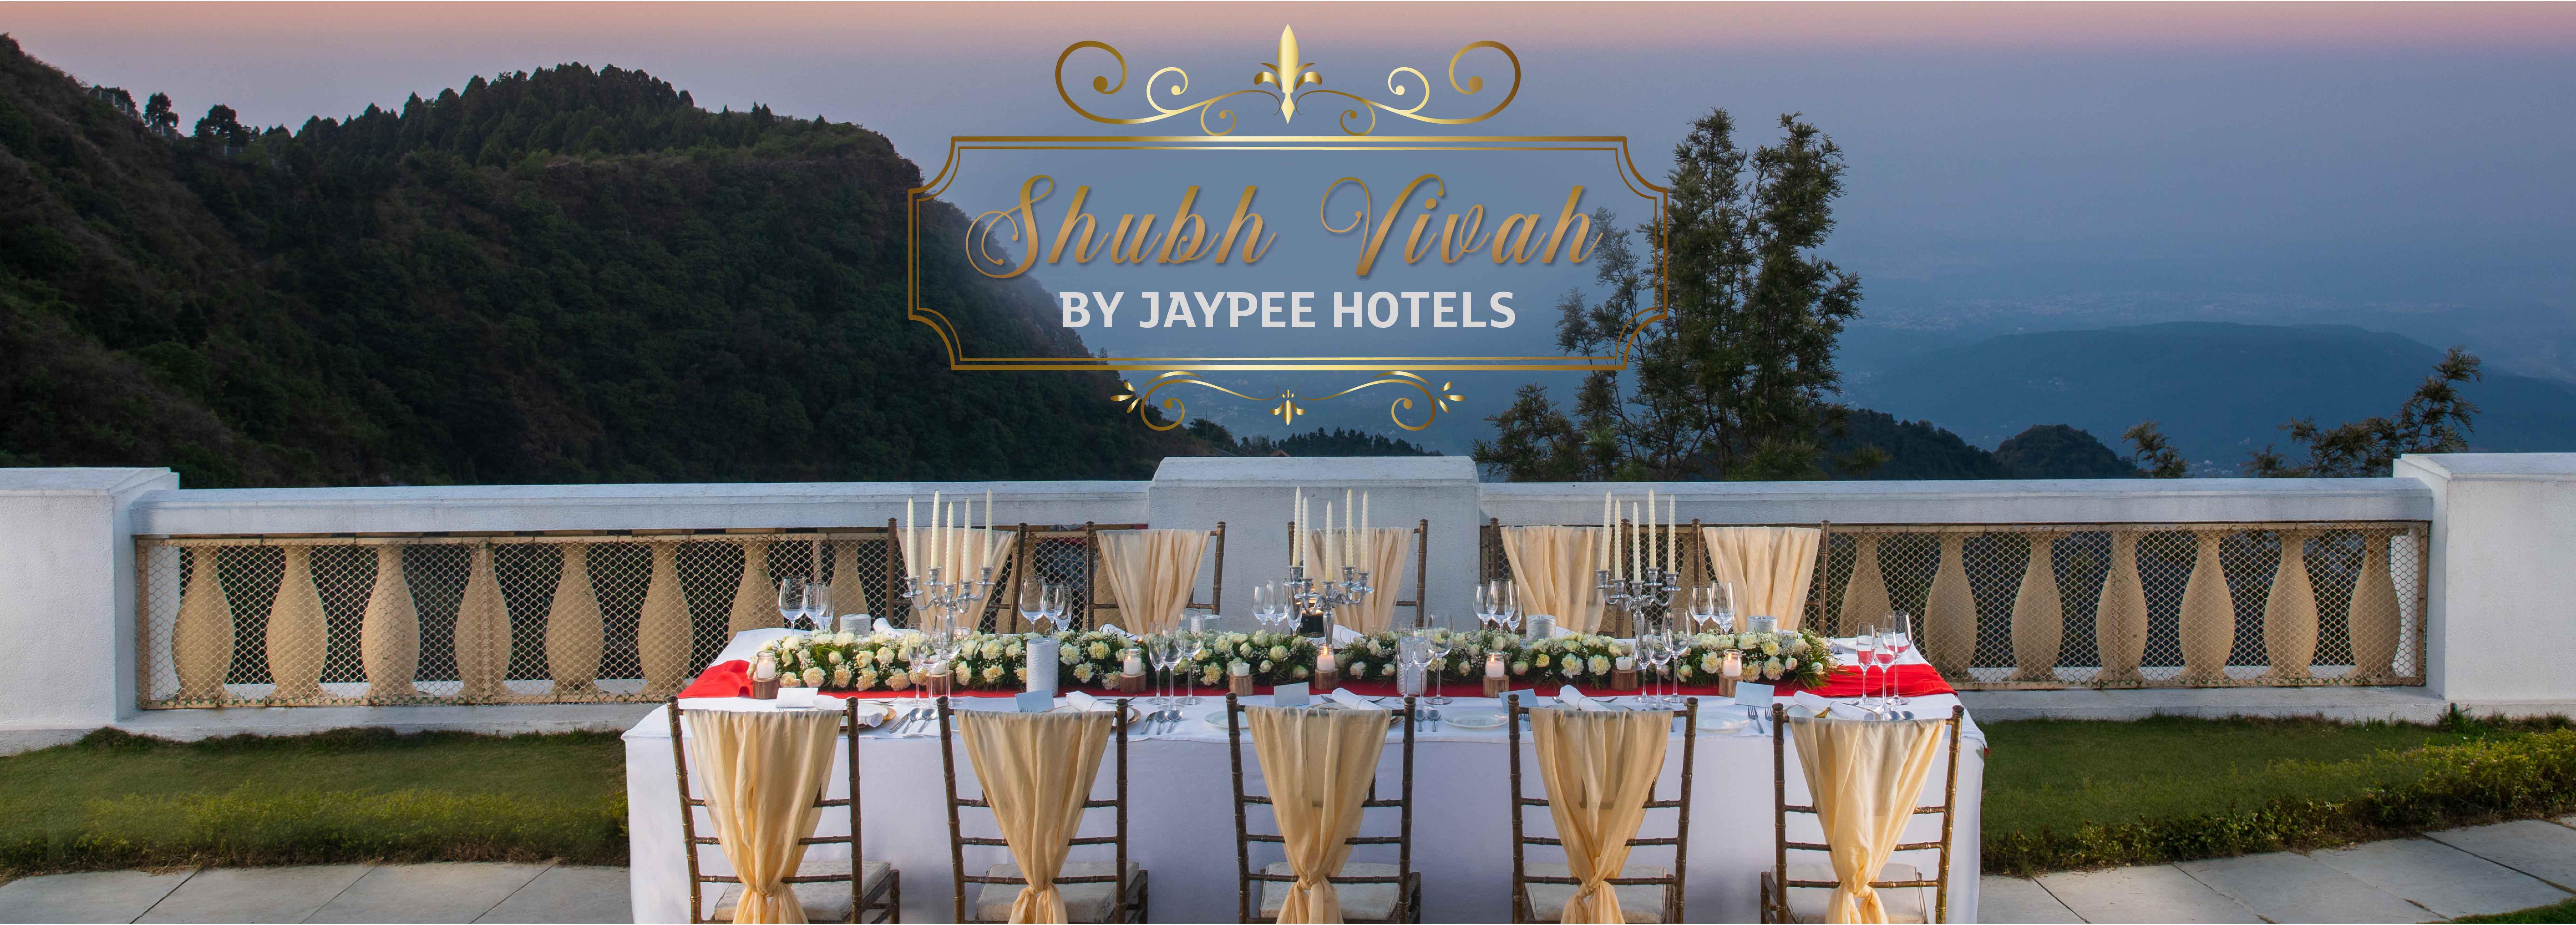 Luxury Wedding Banquet Hall